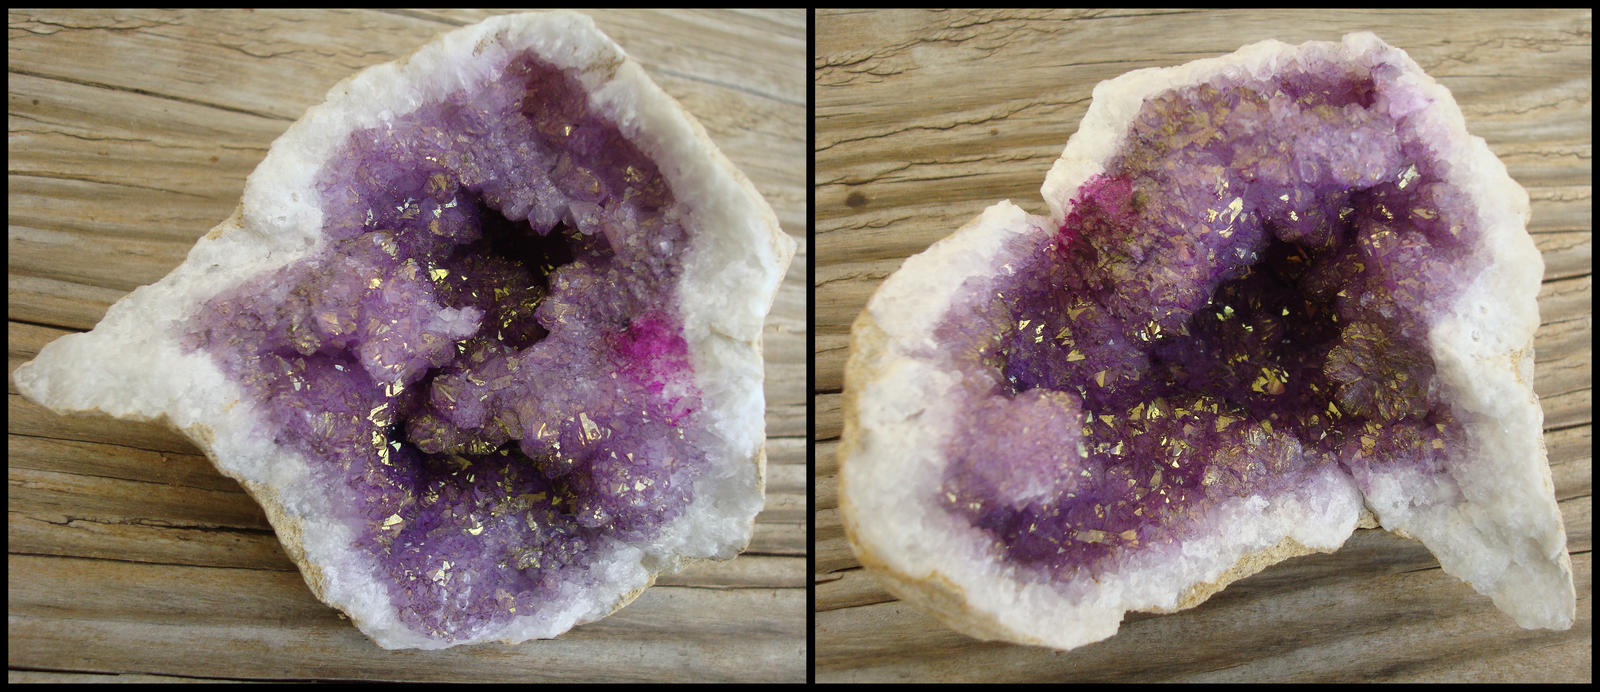 Died Geode by flufdrax